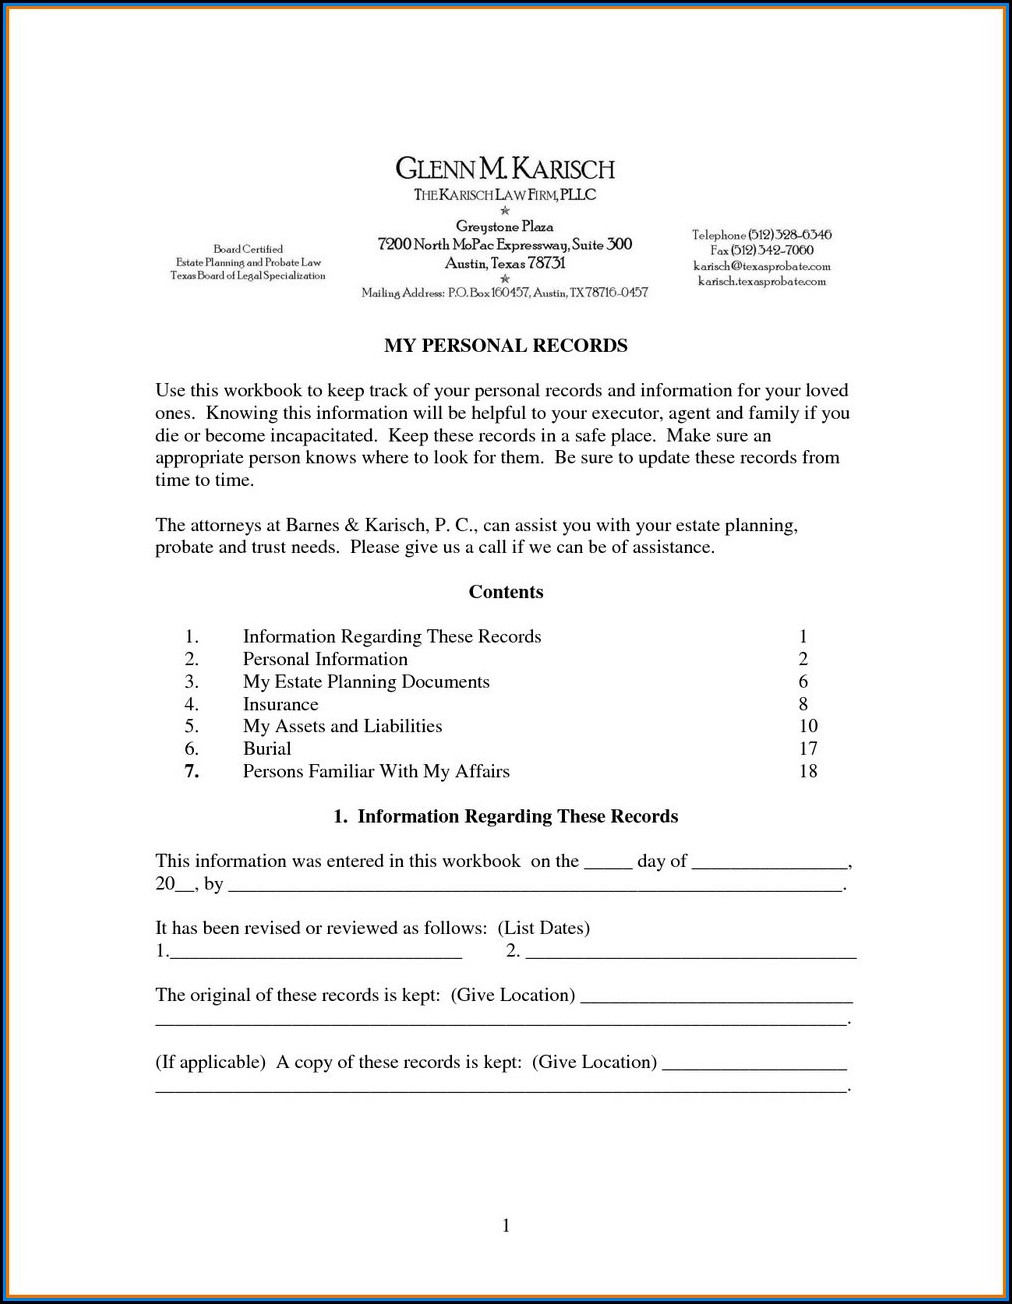 Tarrant County Divorce Filing Fee